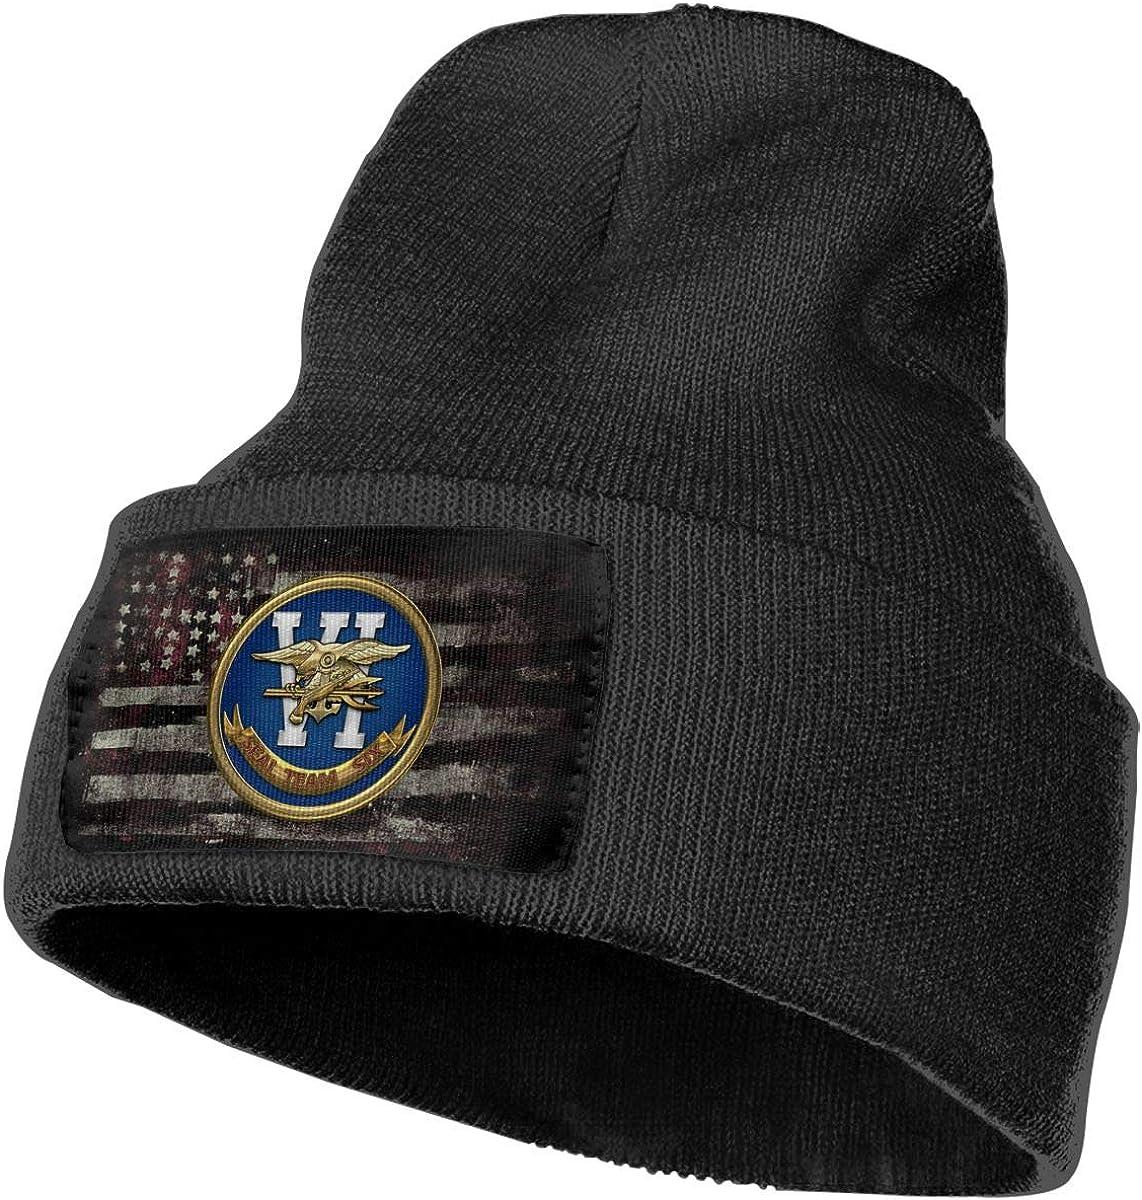 US Navy Seal Team Six Mens Beanie Cap Skull Cap Winter Warm Knitting Hats.